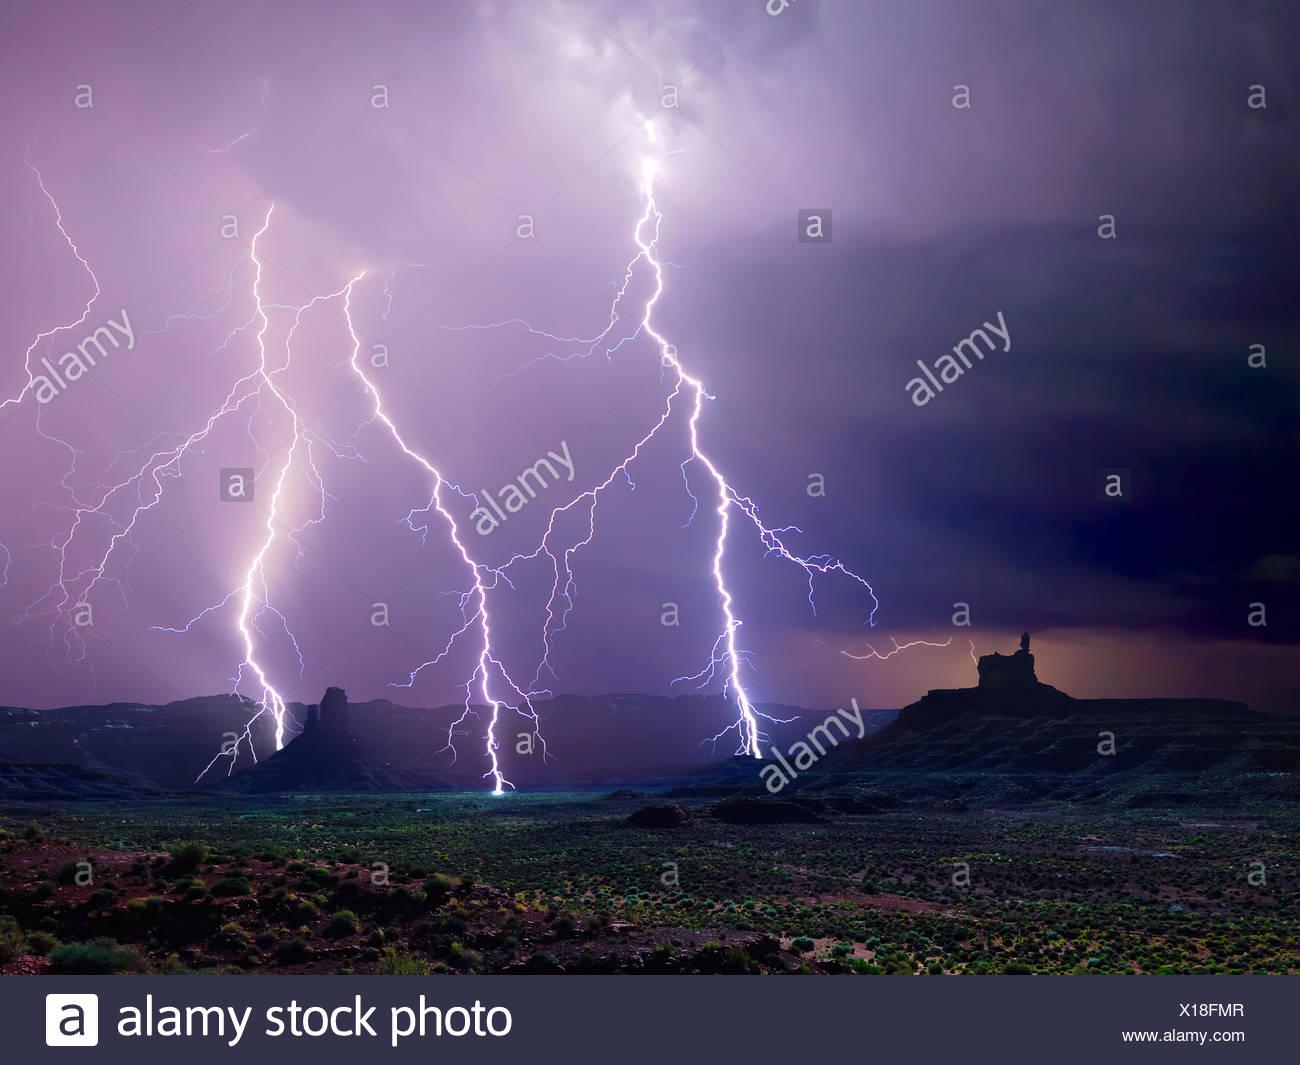 Lightning storm, Valley of the Gods, Utah, America, USA - Stock Image